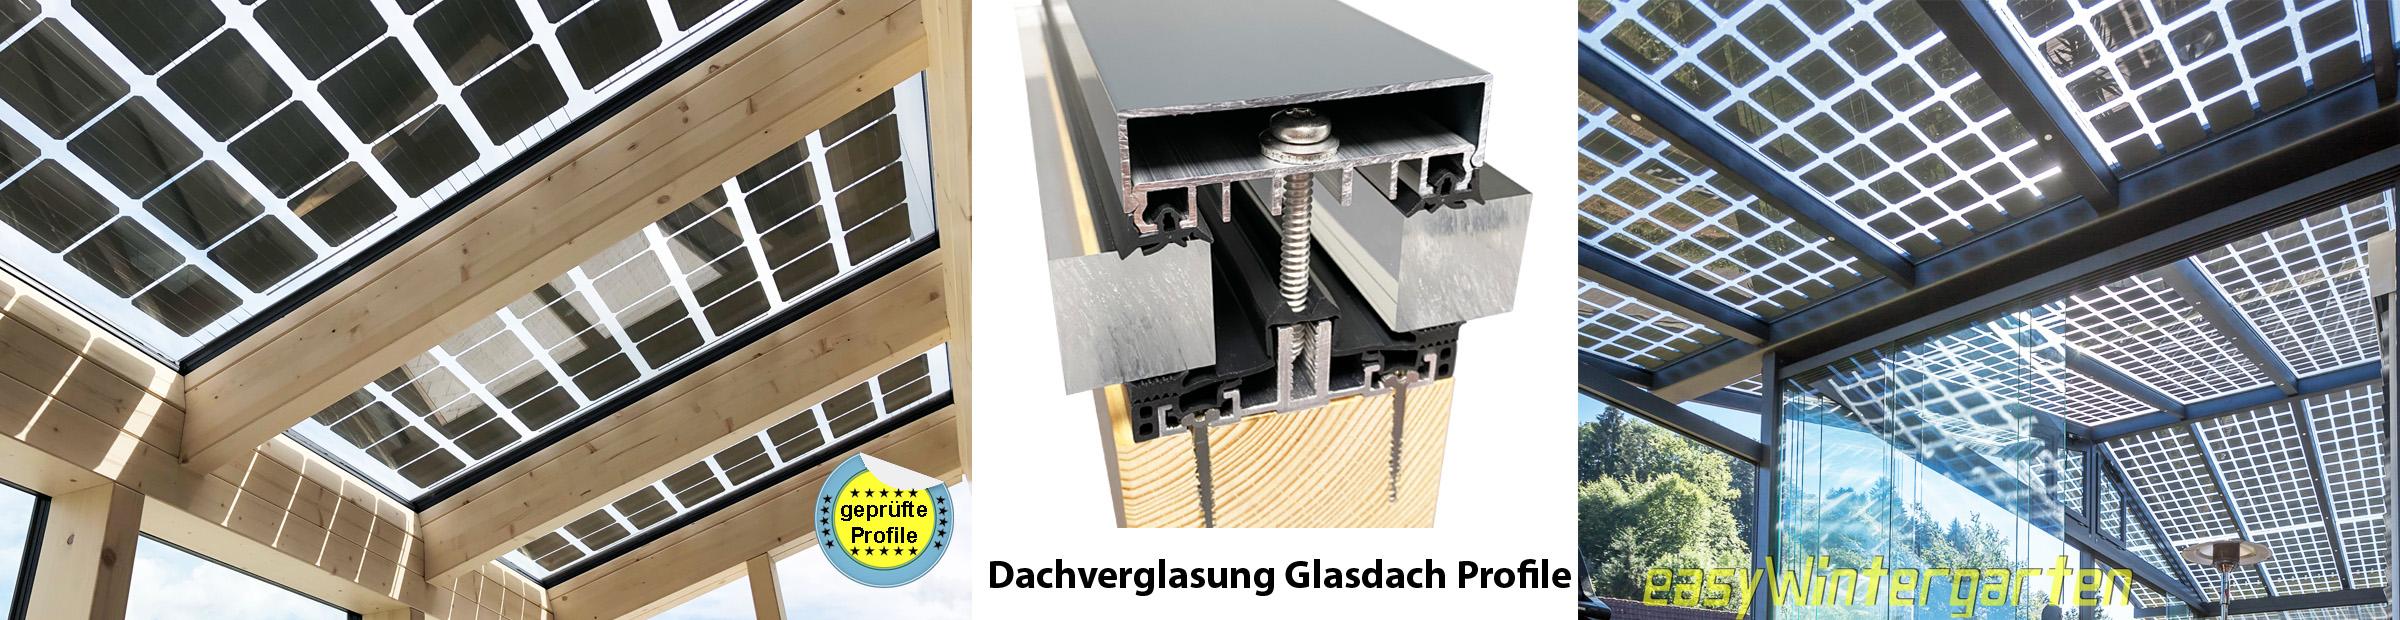 dachverglasung glasdach bauen verlegeprofile f r. Black Bedroom Furniture Sets. Home Design Ideas